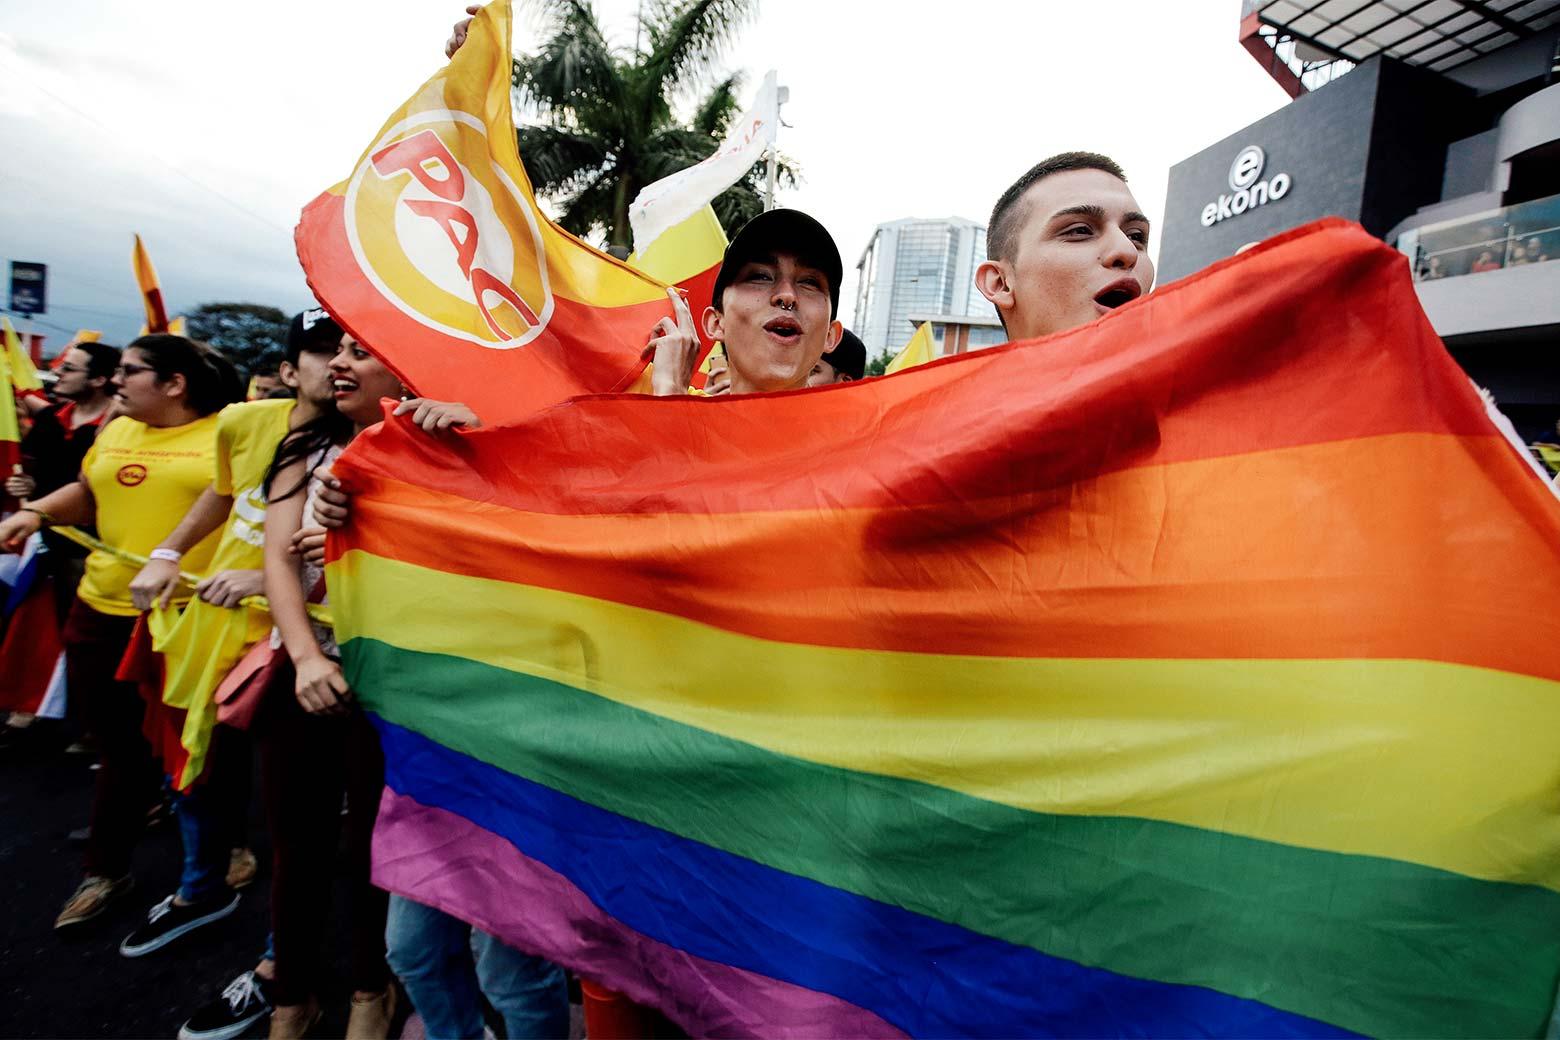 Supporters of Carlos Alvarado Quesada hold up a rainbow LGBTQ pride flag.